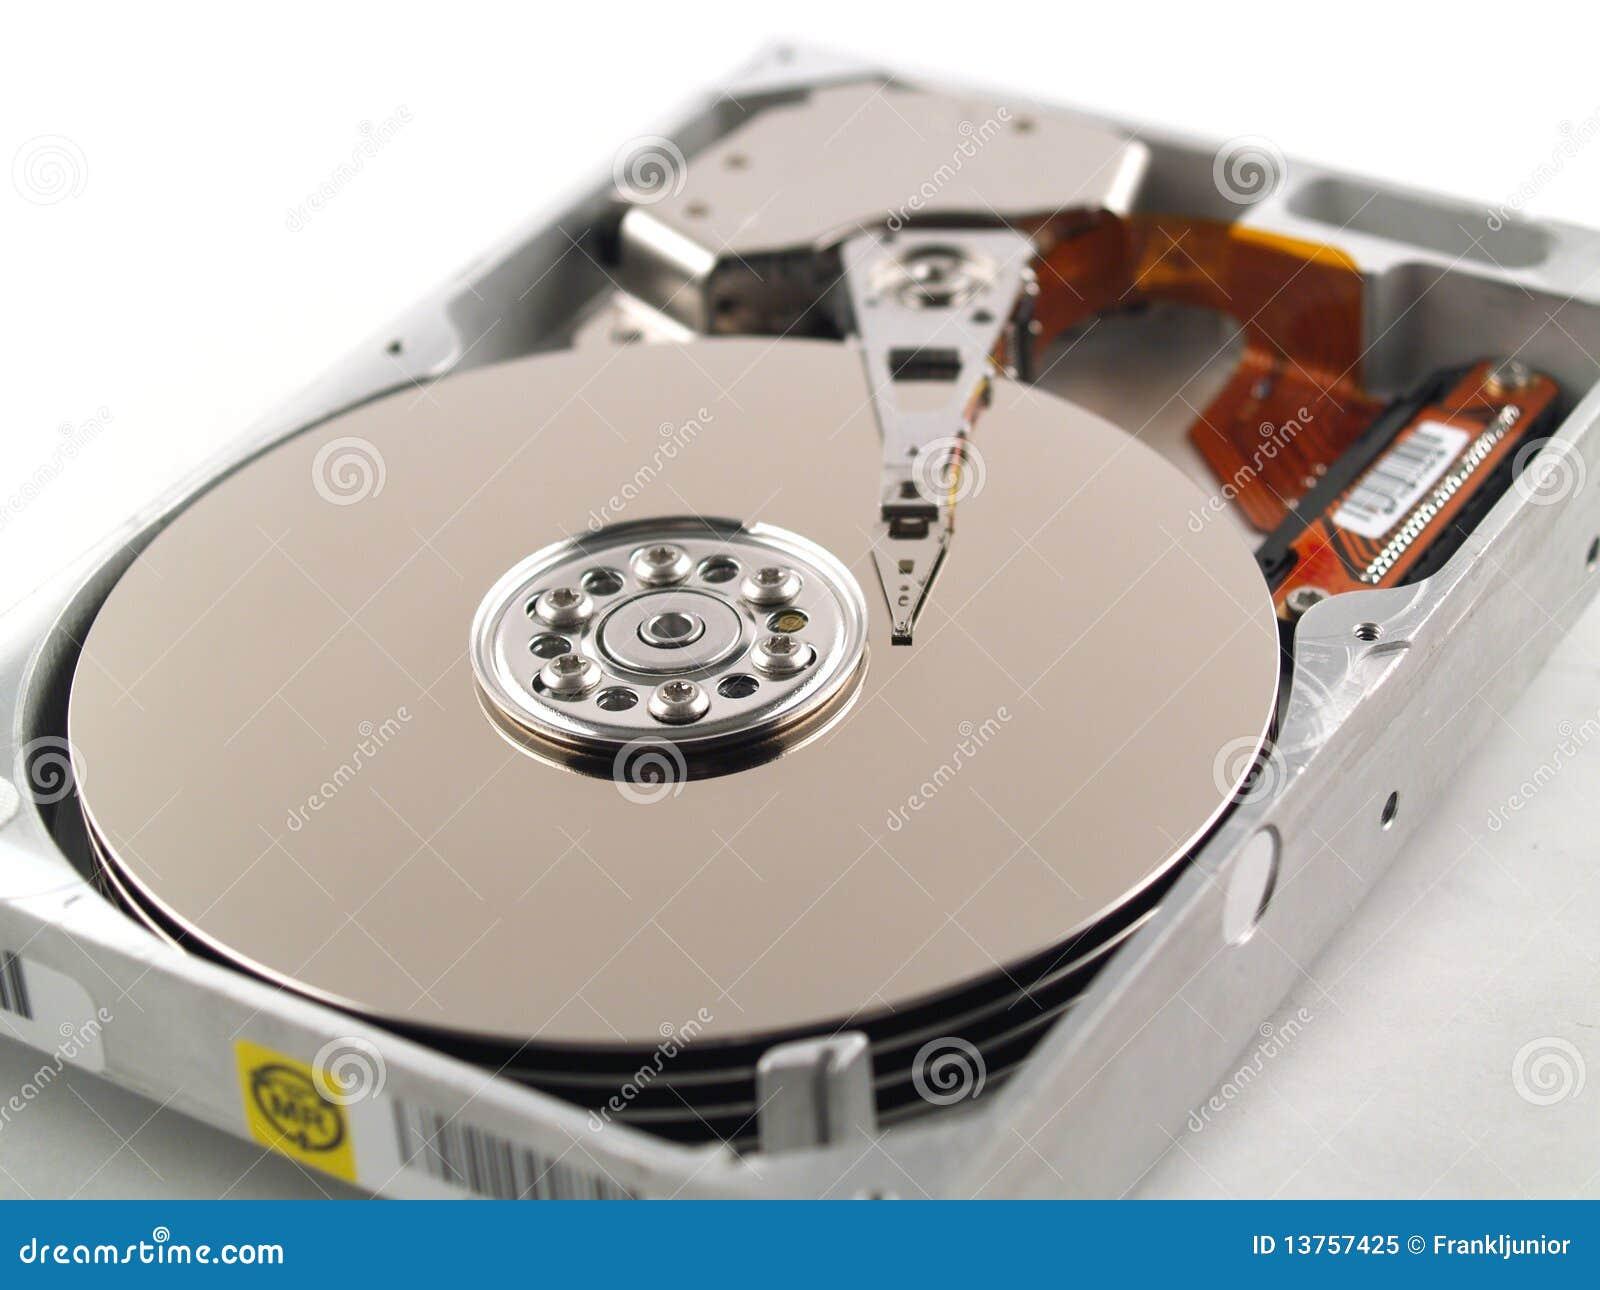 how to open an internal hard drive